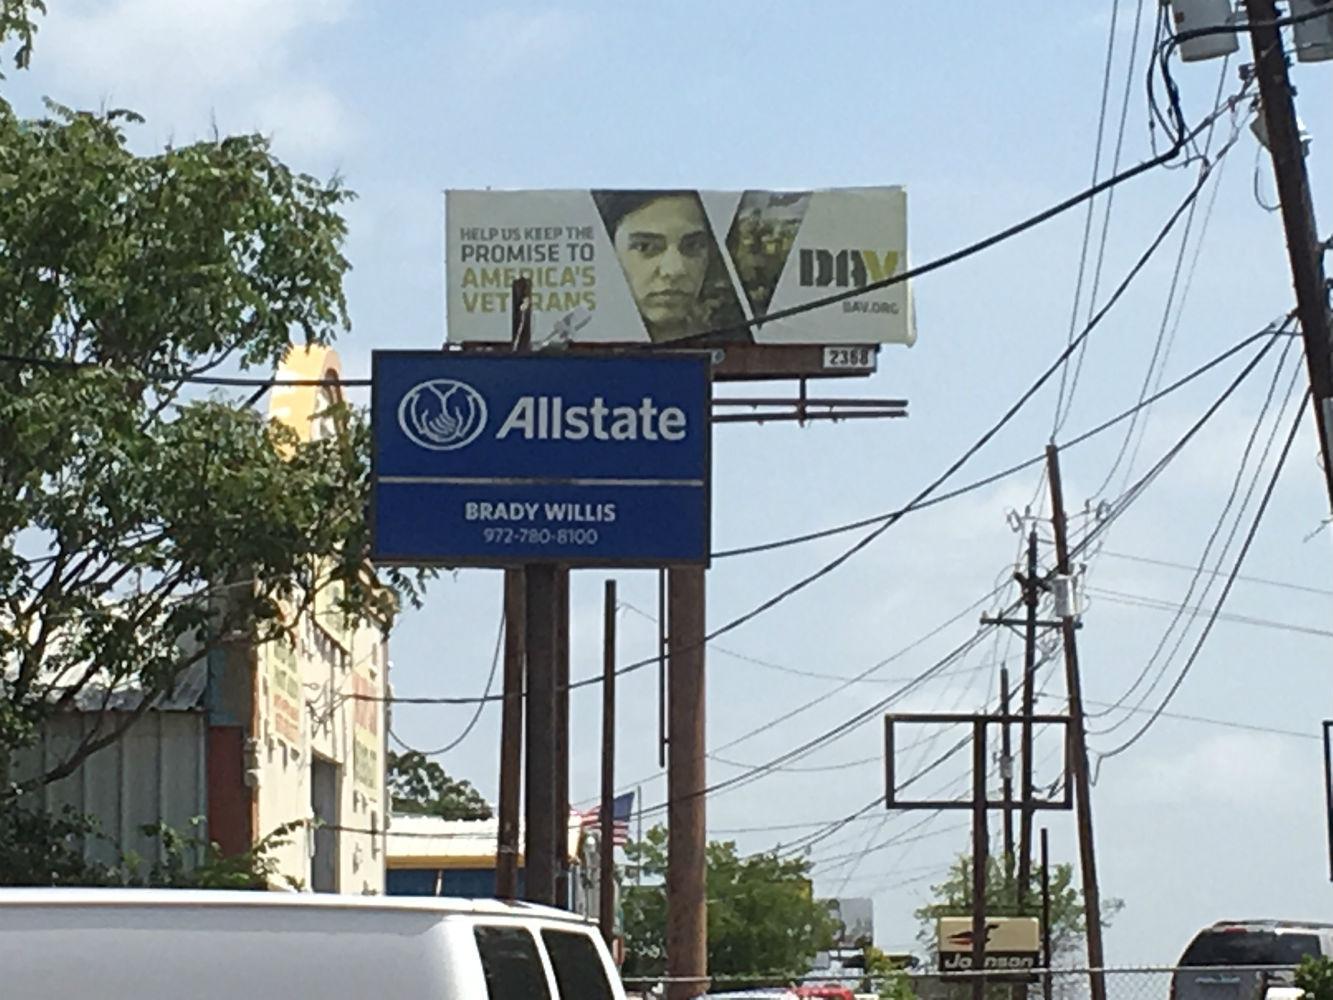 Brady Willis: Allstate Insurance image 1